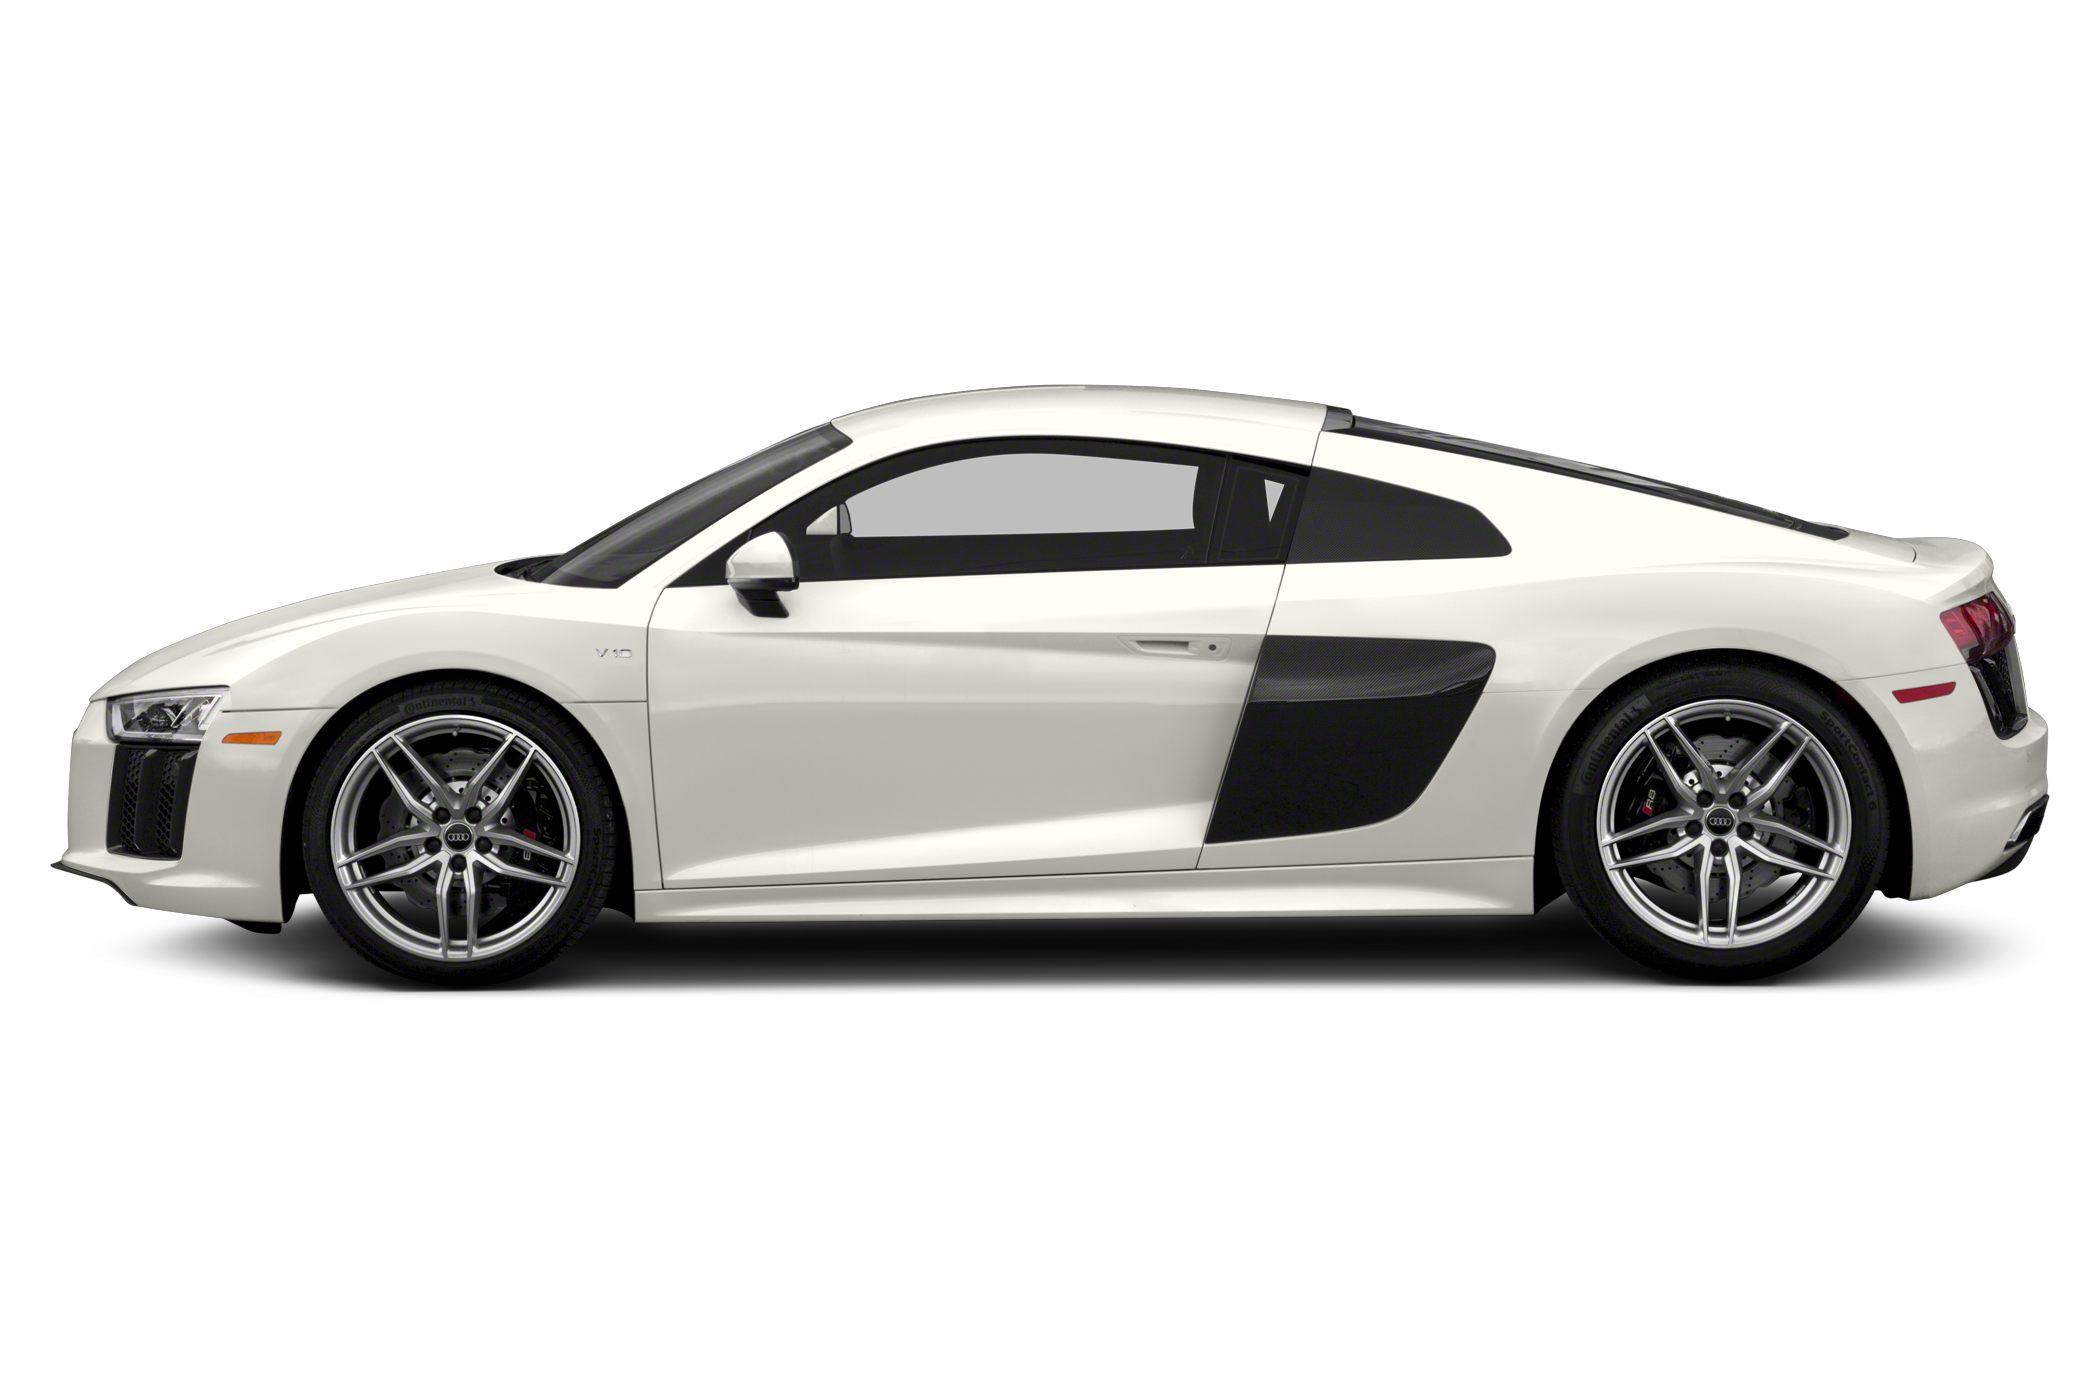 Audi R For Sale In Vaughan Pfaff Audi Vaughan - 2018 audi r8 msrp